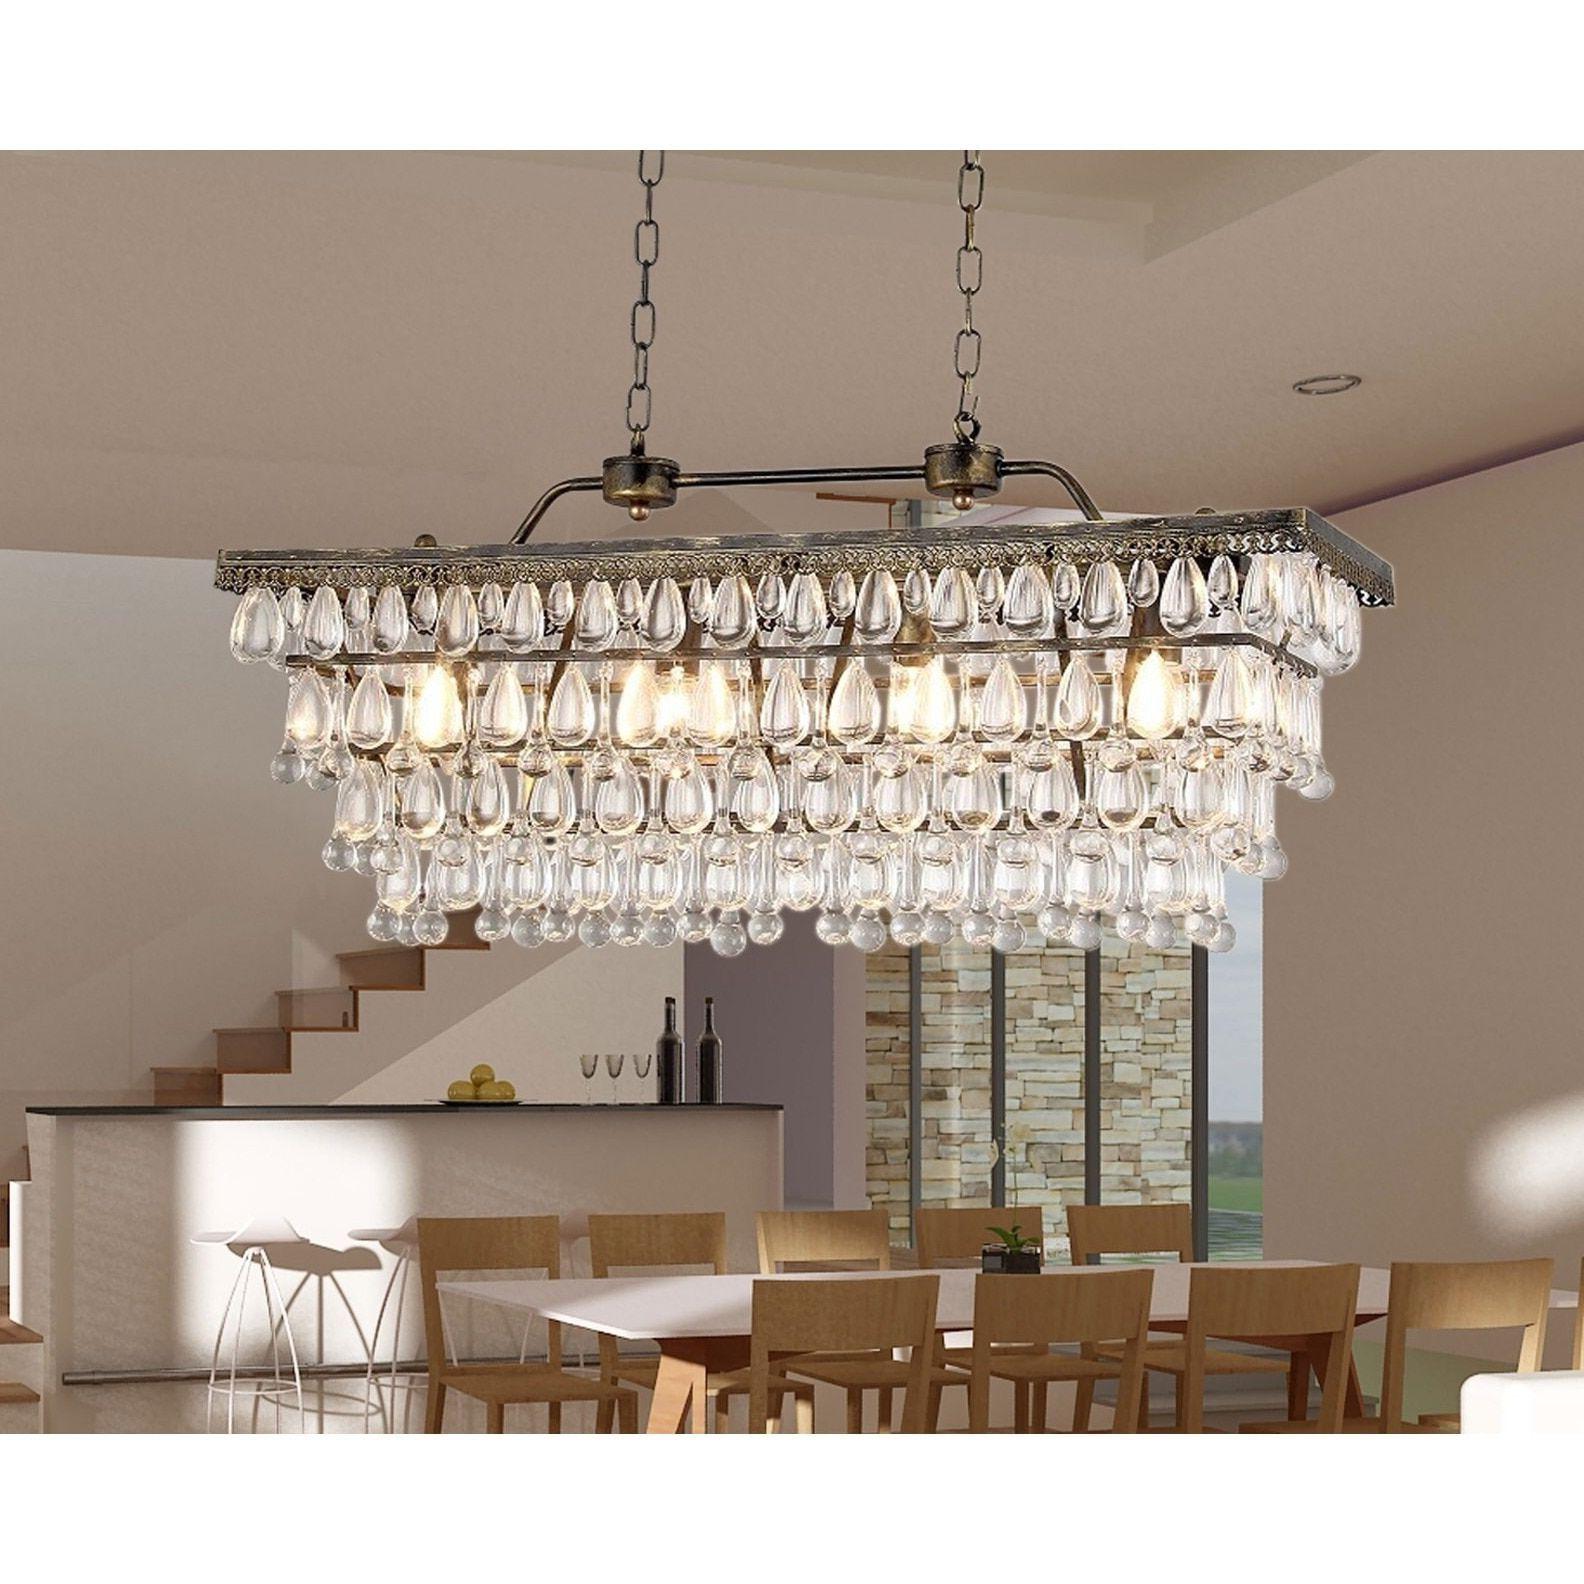 Recent Whitten 4-Light Crystal Chandeliers in Huskar Bronze 4 Light Pendant With Crystal Shade – Artofit